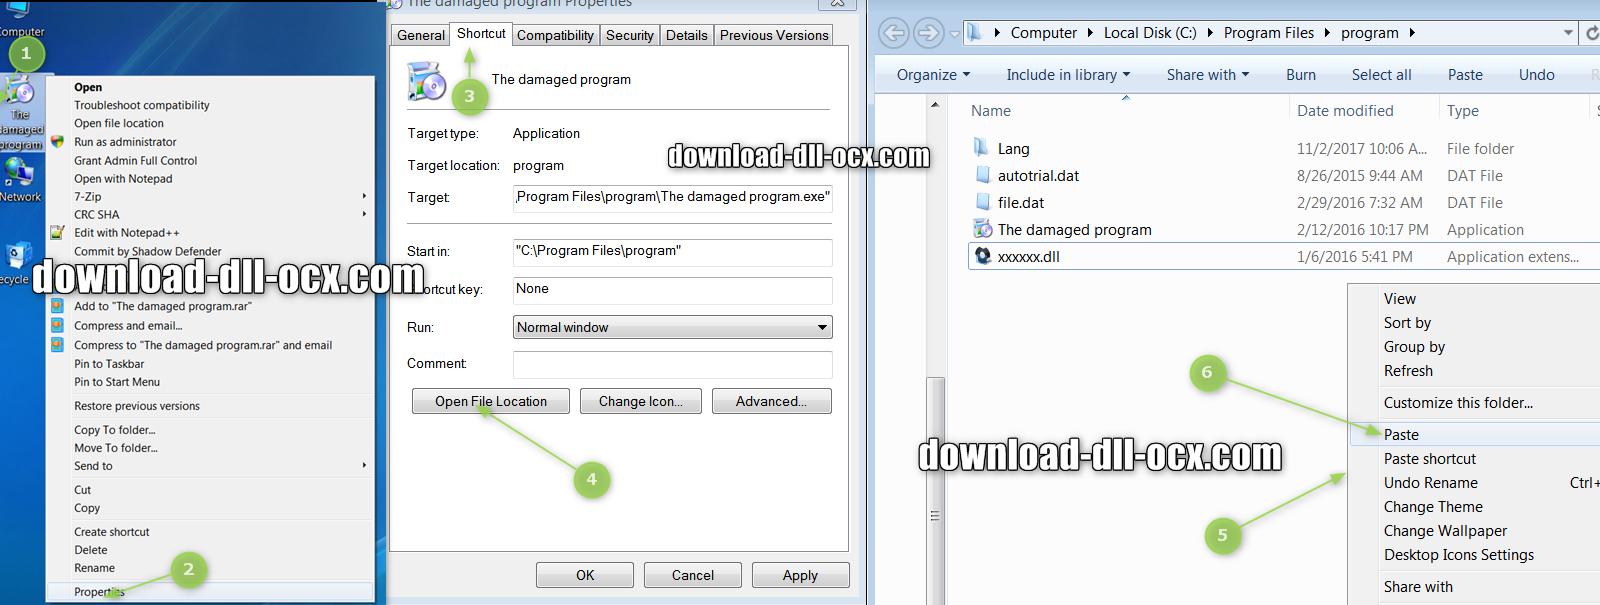 how to install jgemgen.dll file? for fix missing